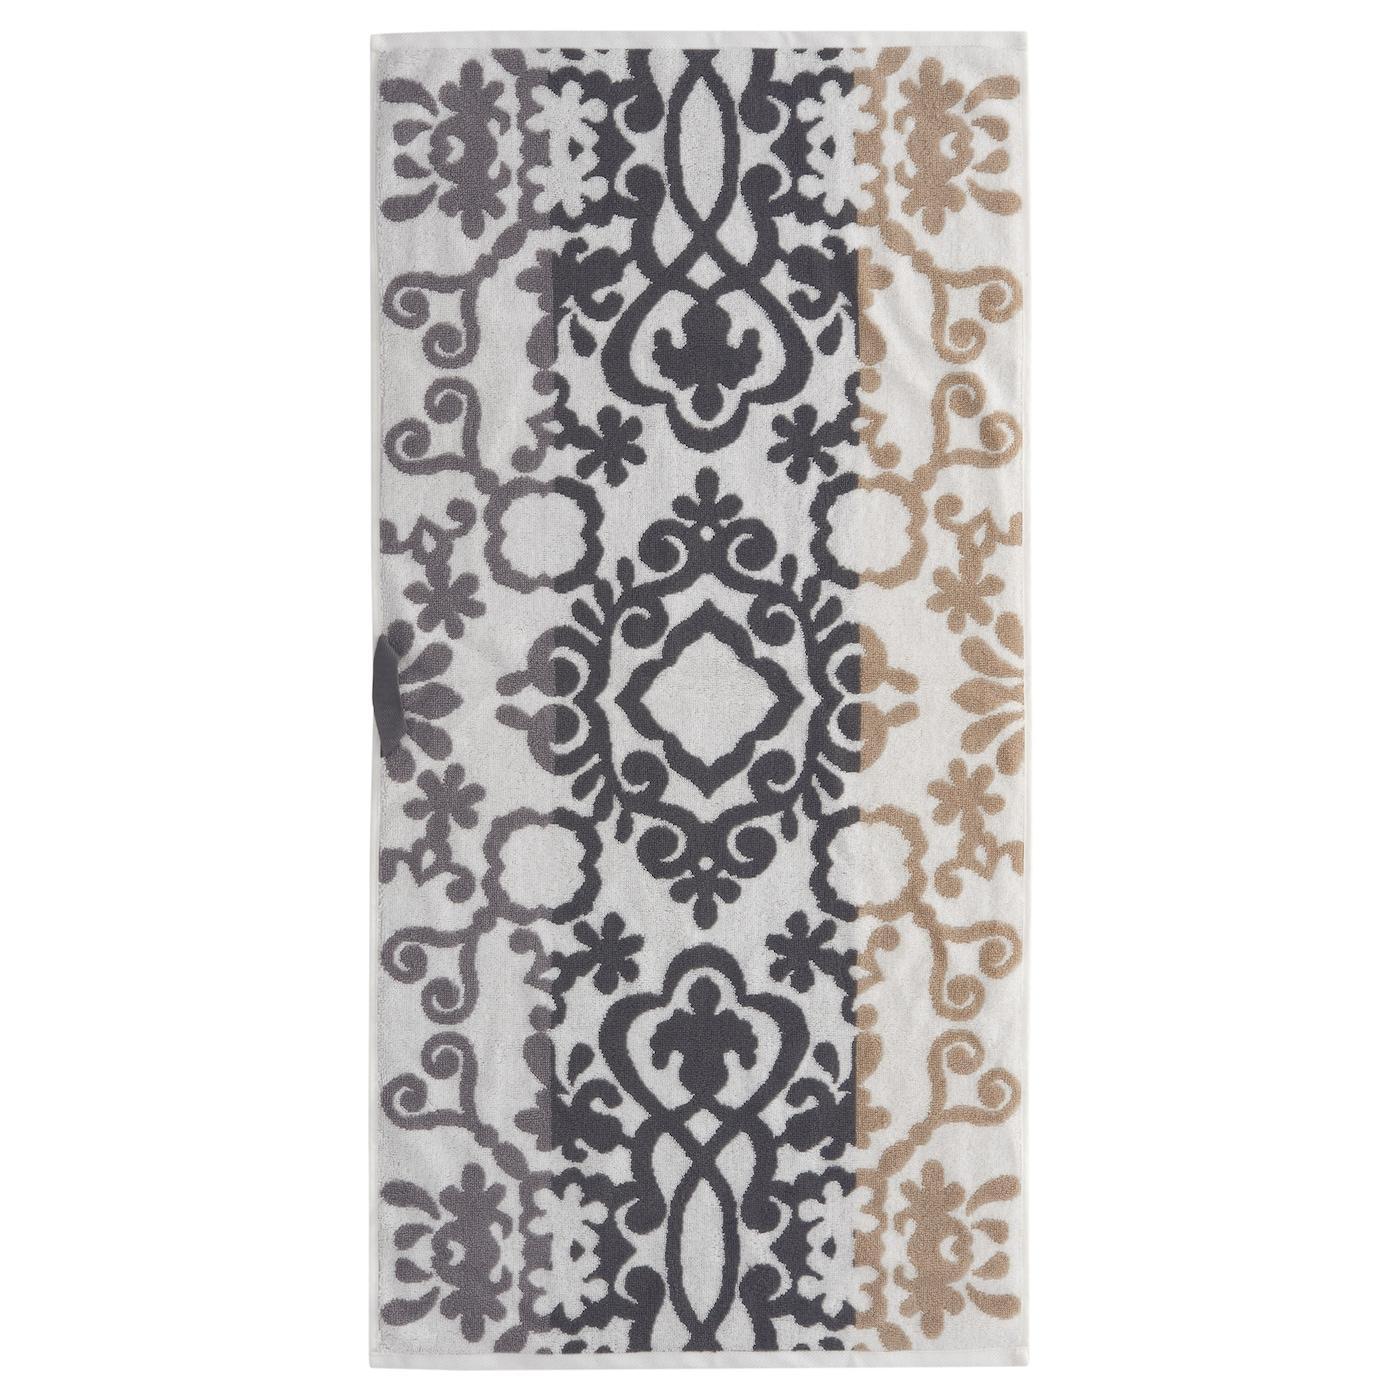 bl djan bath towel multicolour 70x140 cm ikea. Black Bedroom Furniture Sets. Home Design Ideas